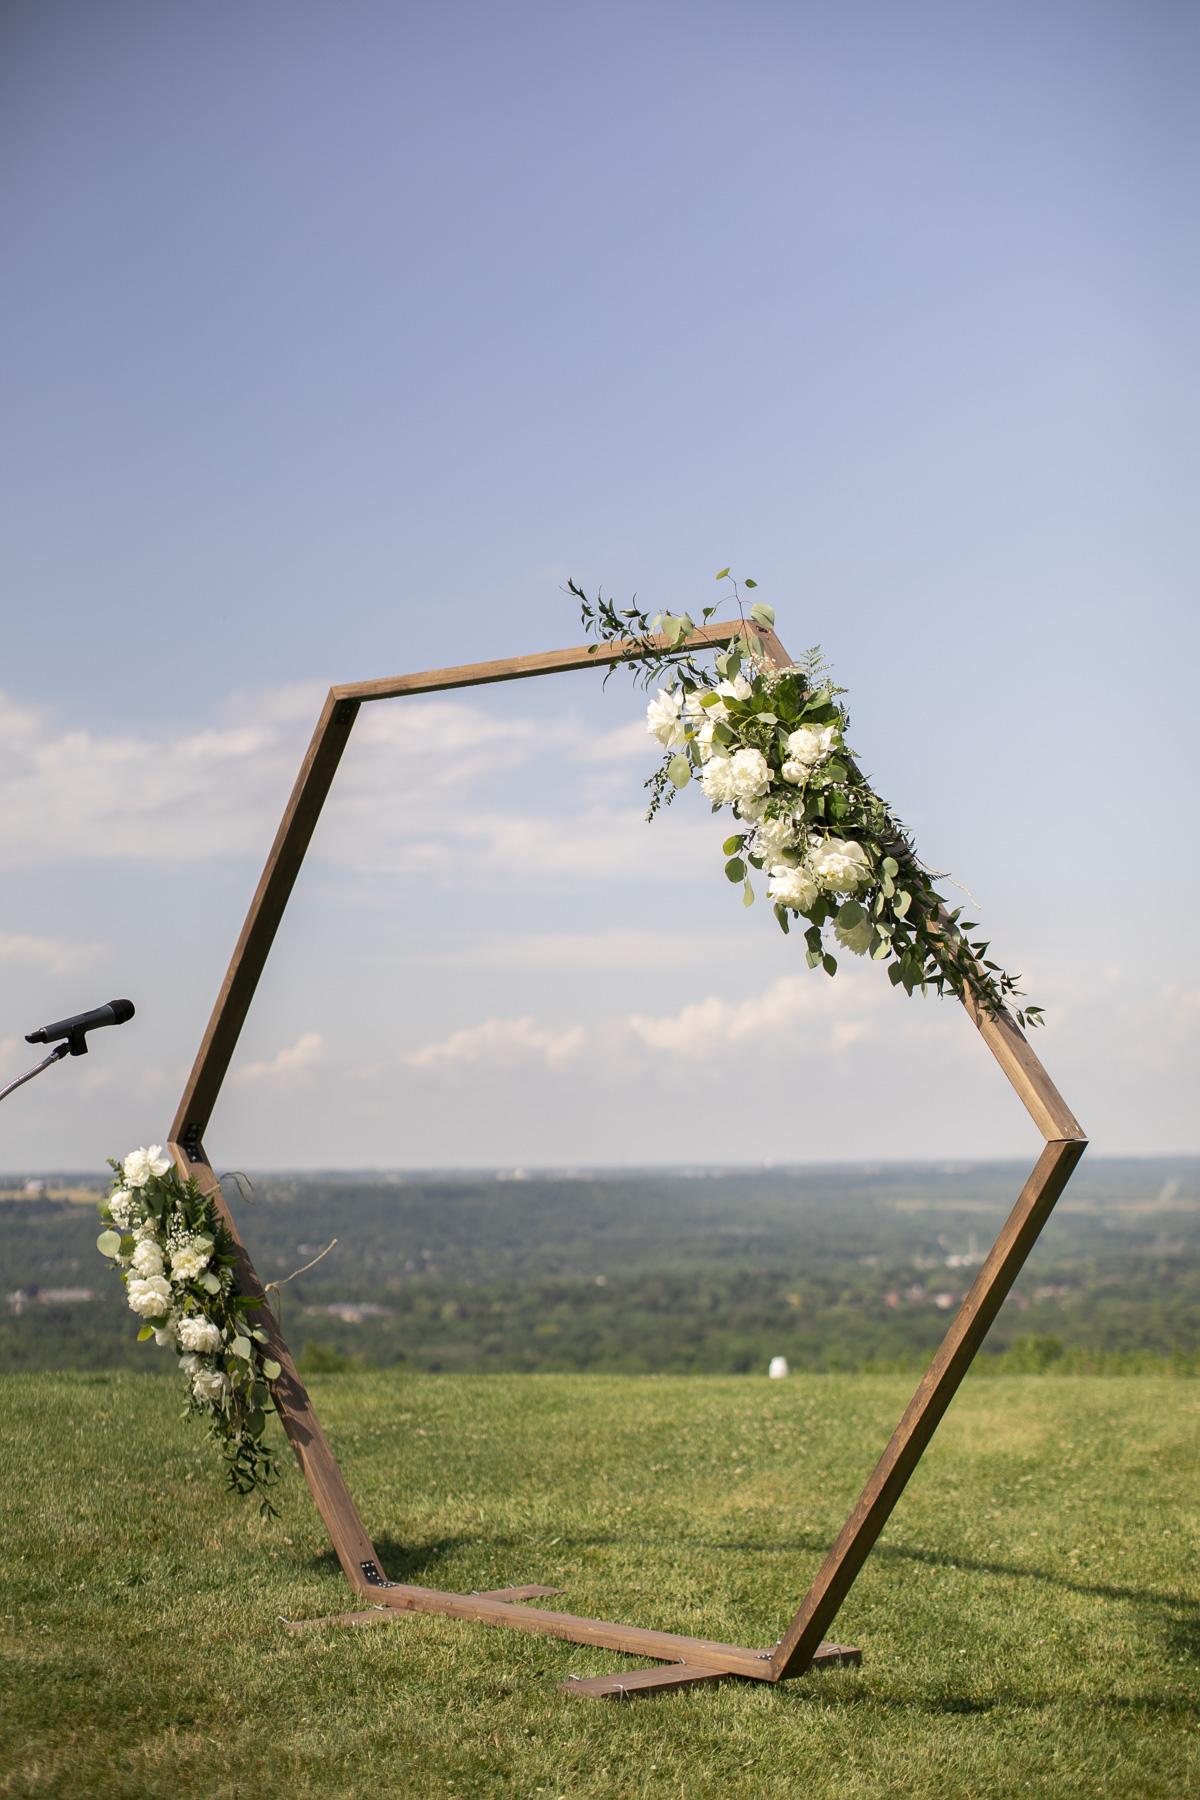 vineyard-bride-philosophy-studios-outdoor-summer-wedding-the-tamahaac-club-niagara-ancaster-toronto-vendor-0071.JPG